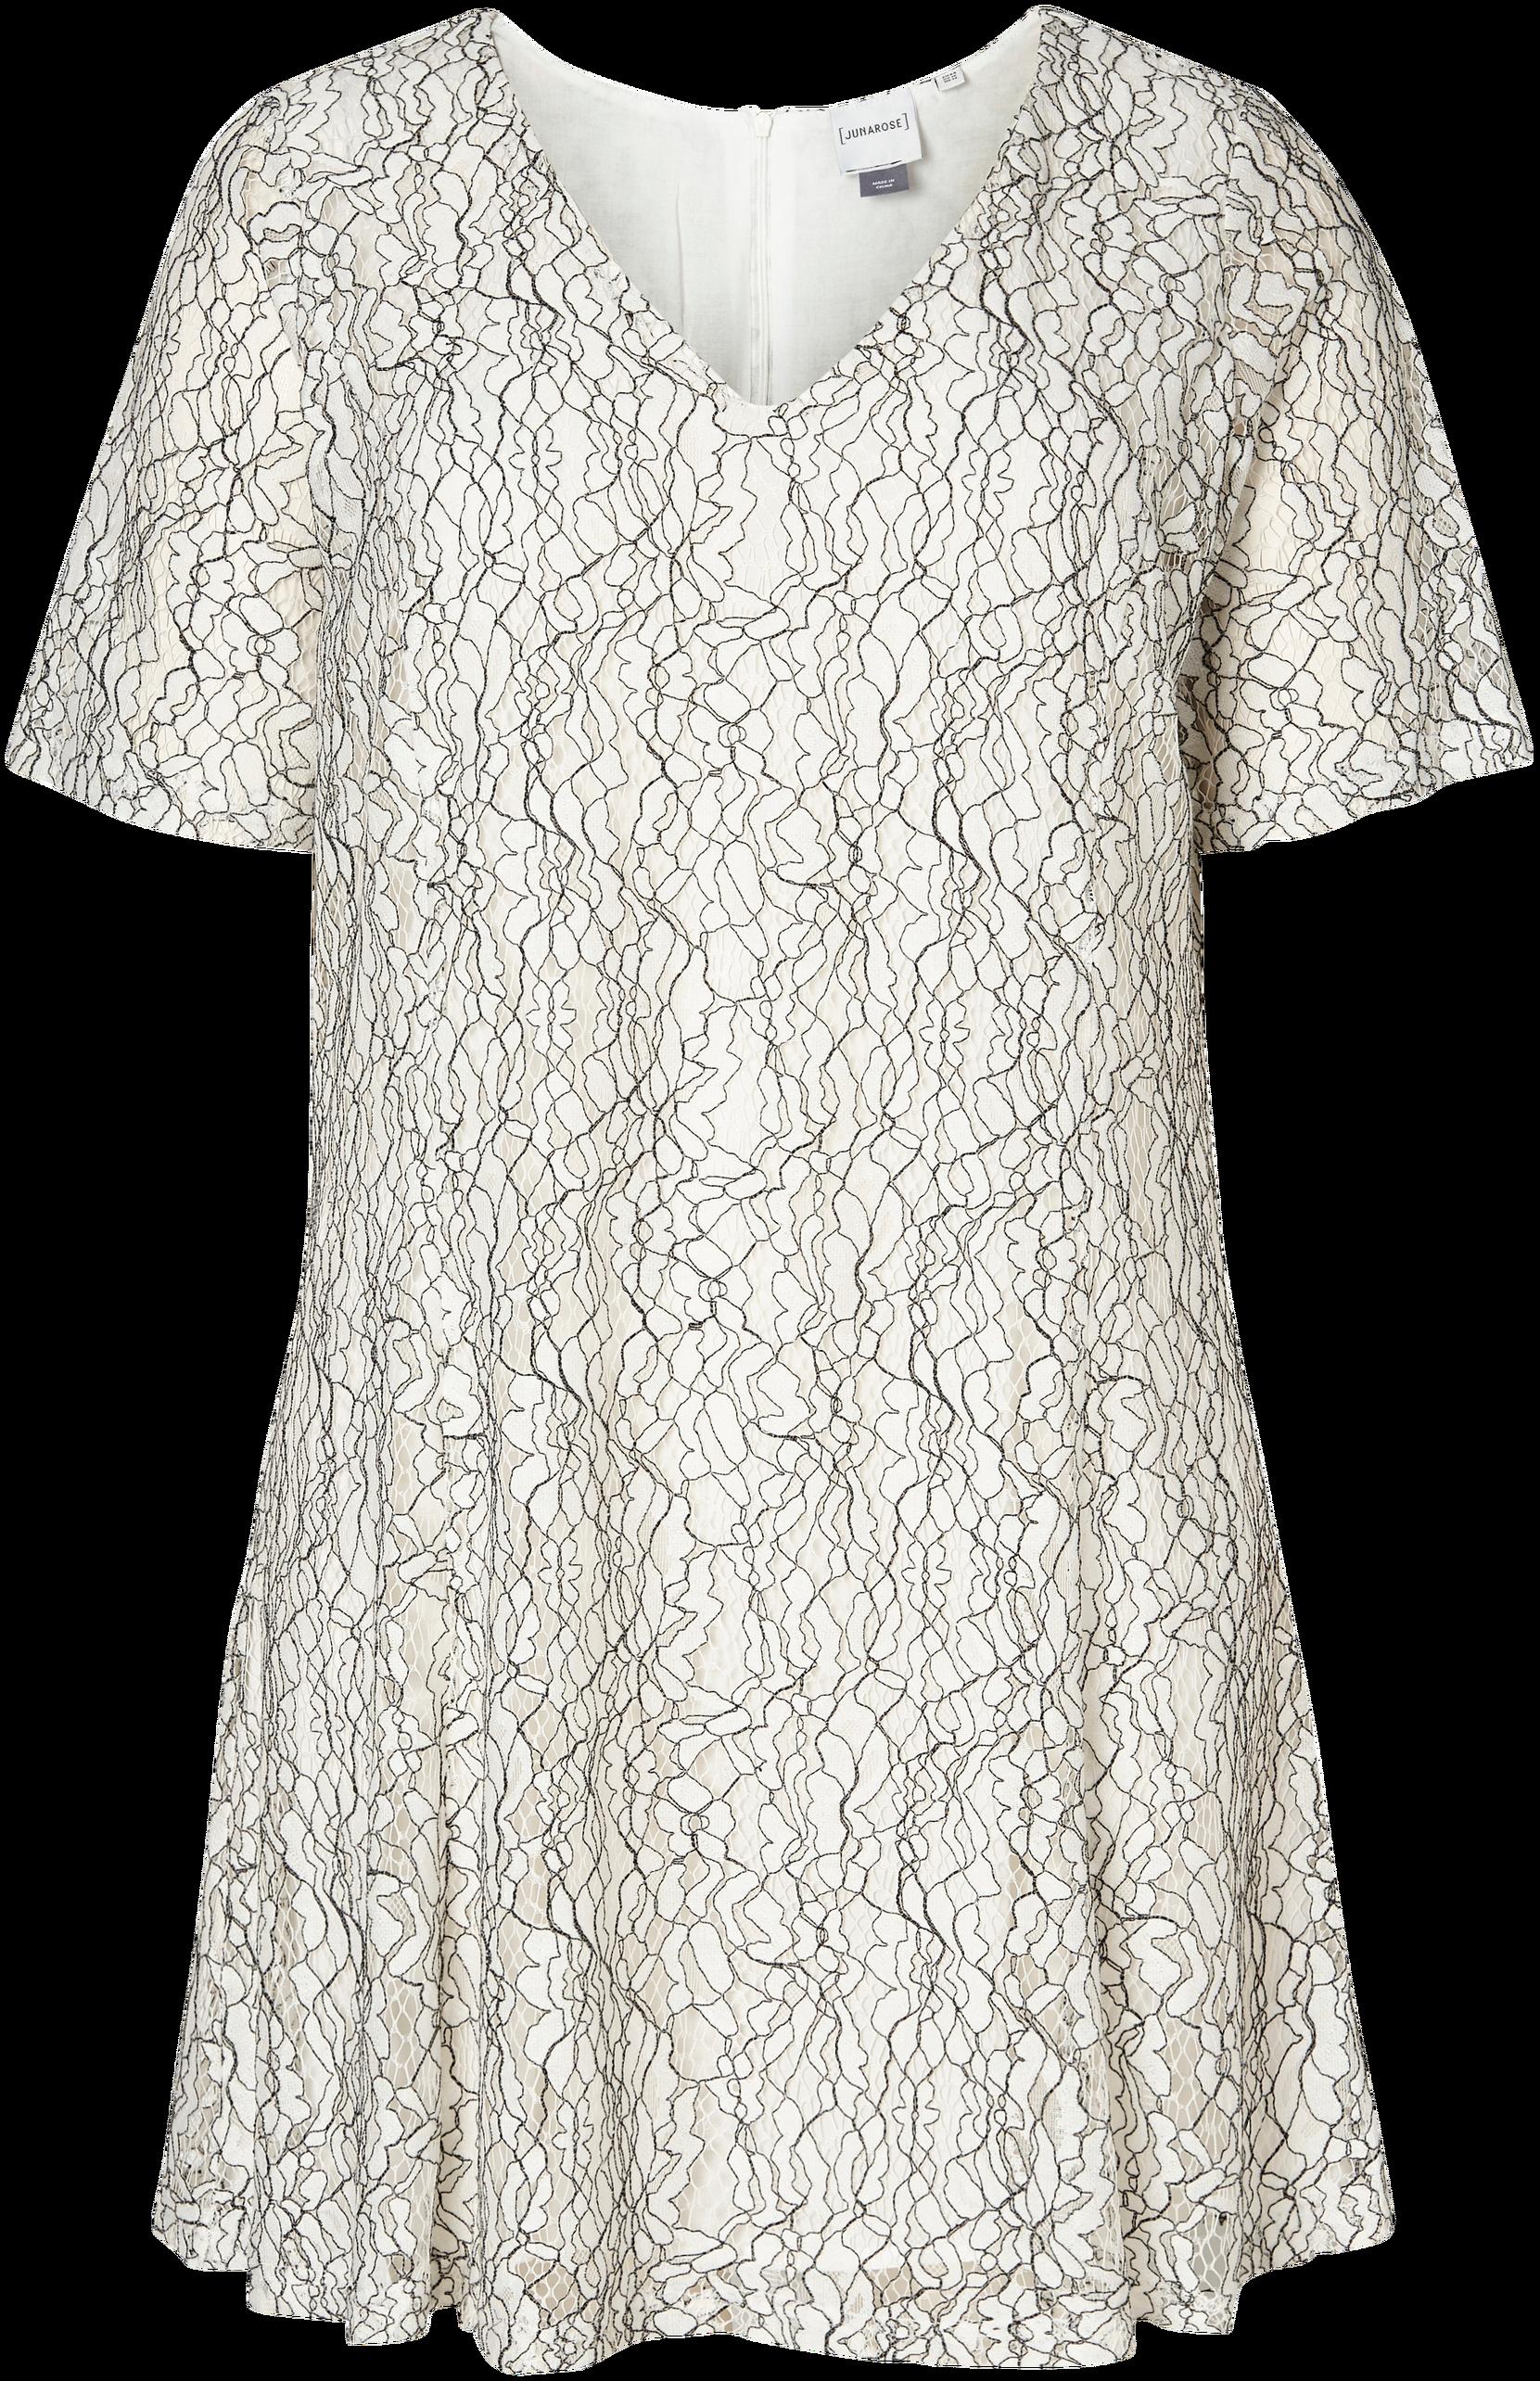 Blondekjole JrMariana Junarose Kjoler til Kvinder i Hvidmønstret